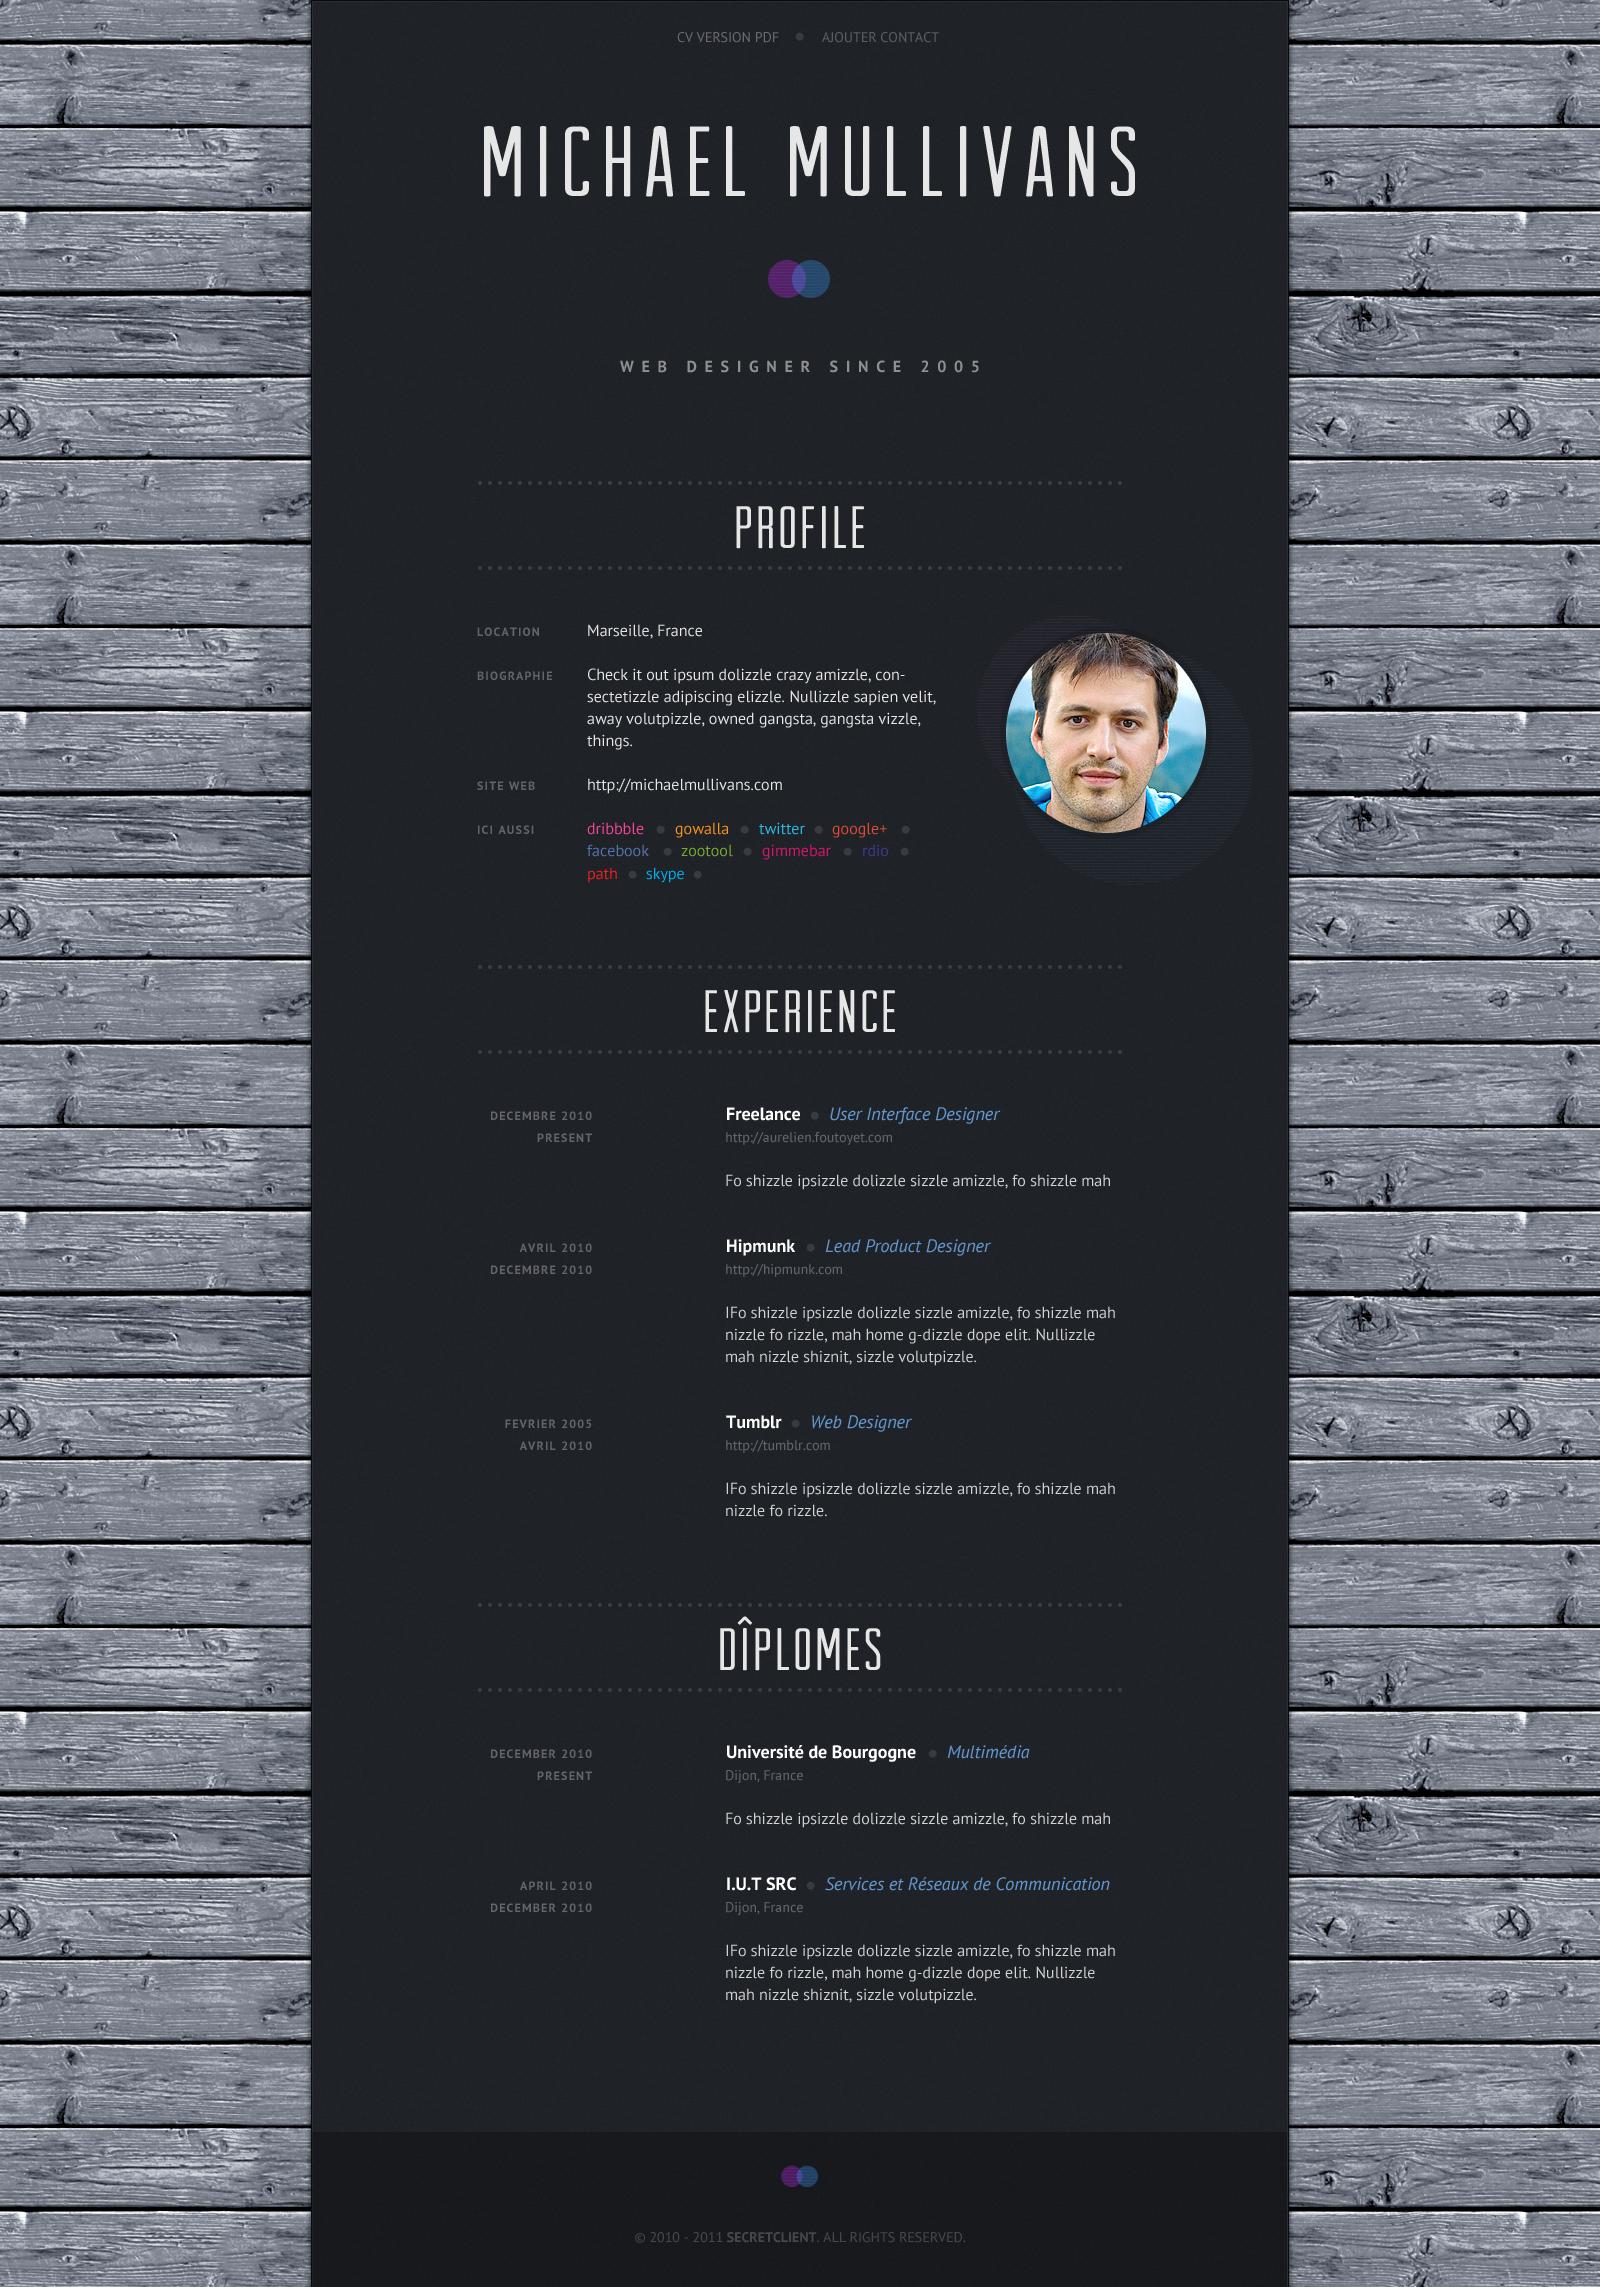 Dribbble Resume Dribbble Largepreview Png By Aurelien Foutoyet Resume Design Creative Graphic Resume Cv Design